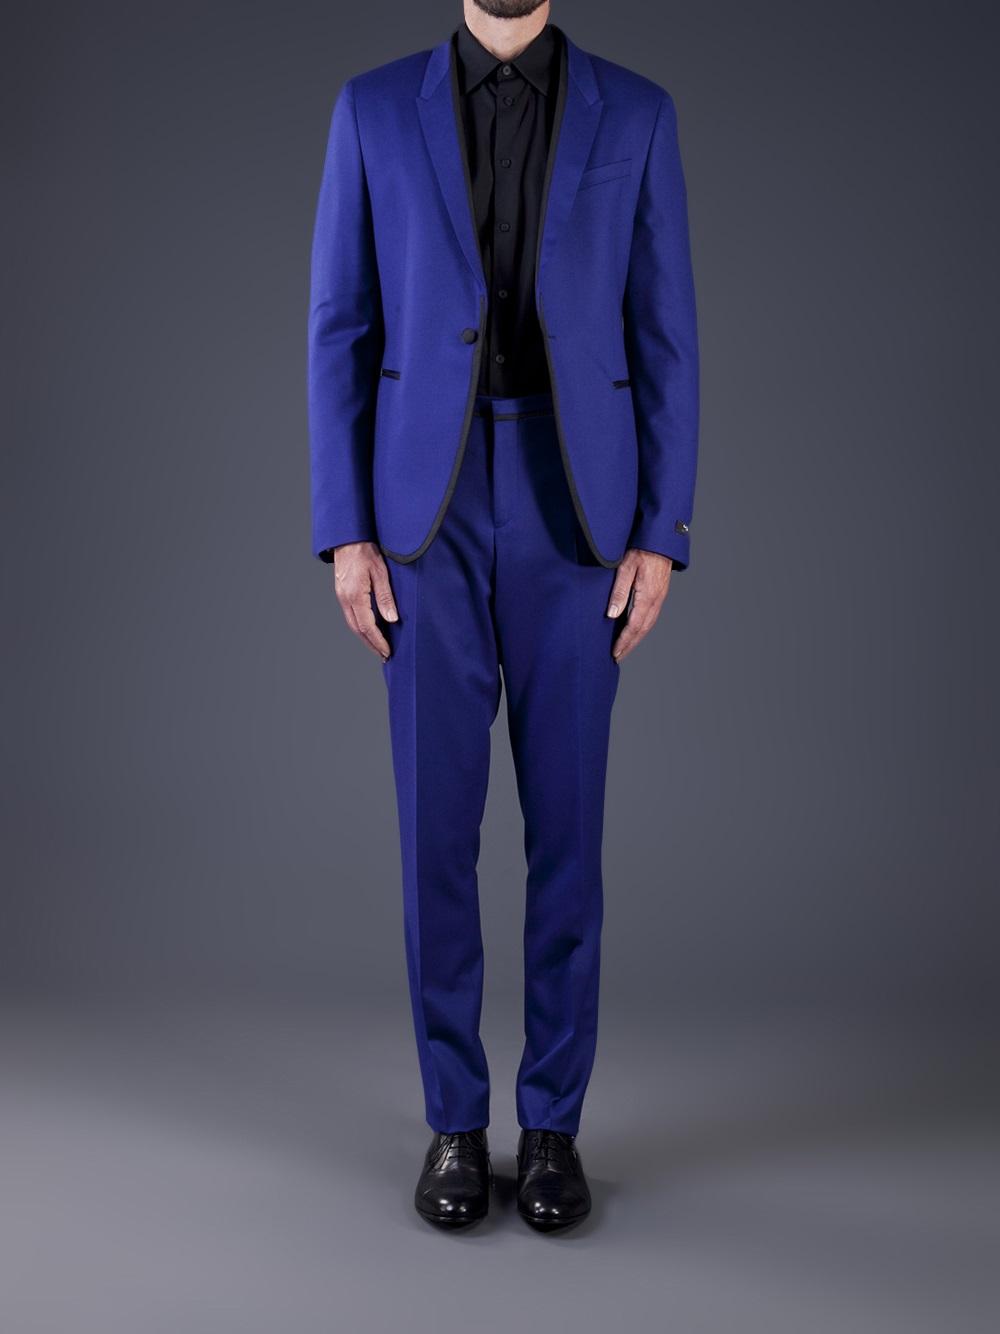 85604d7d23 Paul Smith Paul Smith Wool Suit in Blue for Men - Lyst